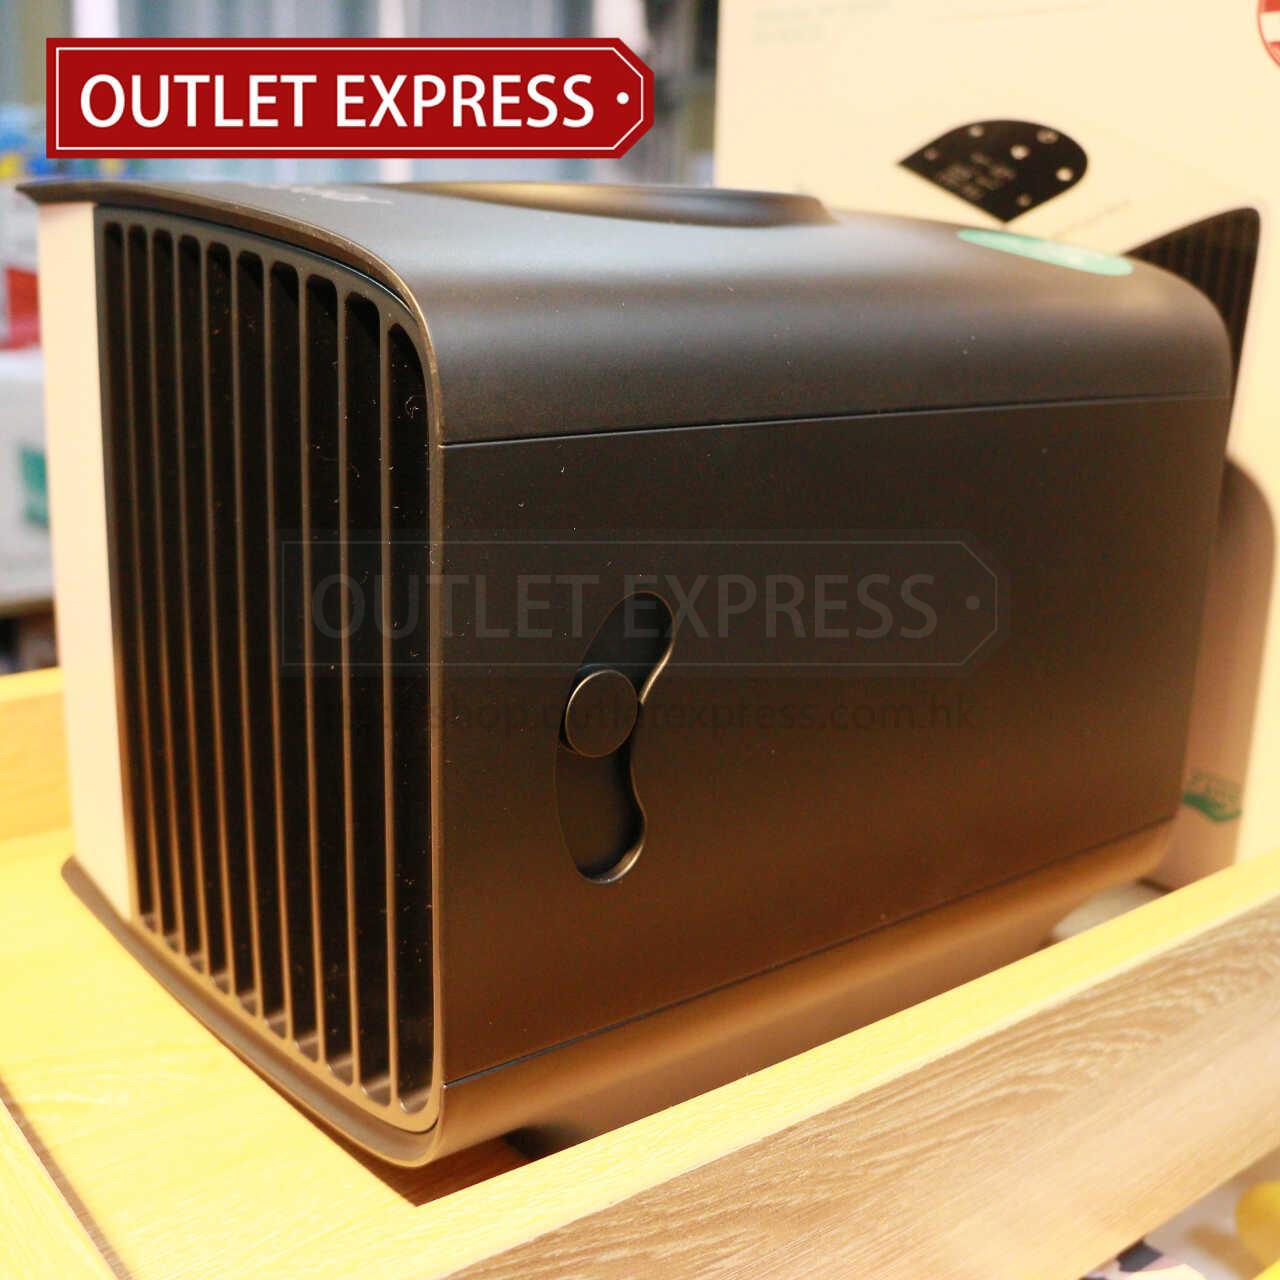 Evapolar 二代小型個人流動冷氣機 (evaSMART EV-3000) | 智能水冷風機 ( 現貨發售 ) | 香港行貨 - Outlet Express HK生活百貨城實拍相片